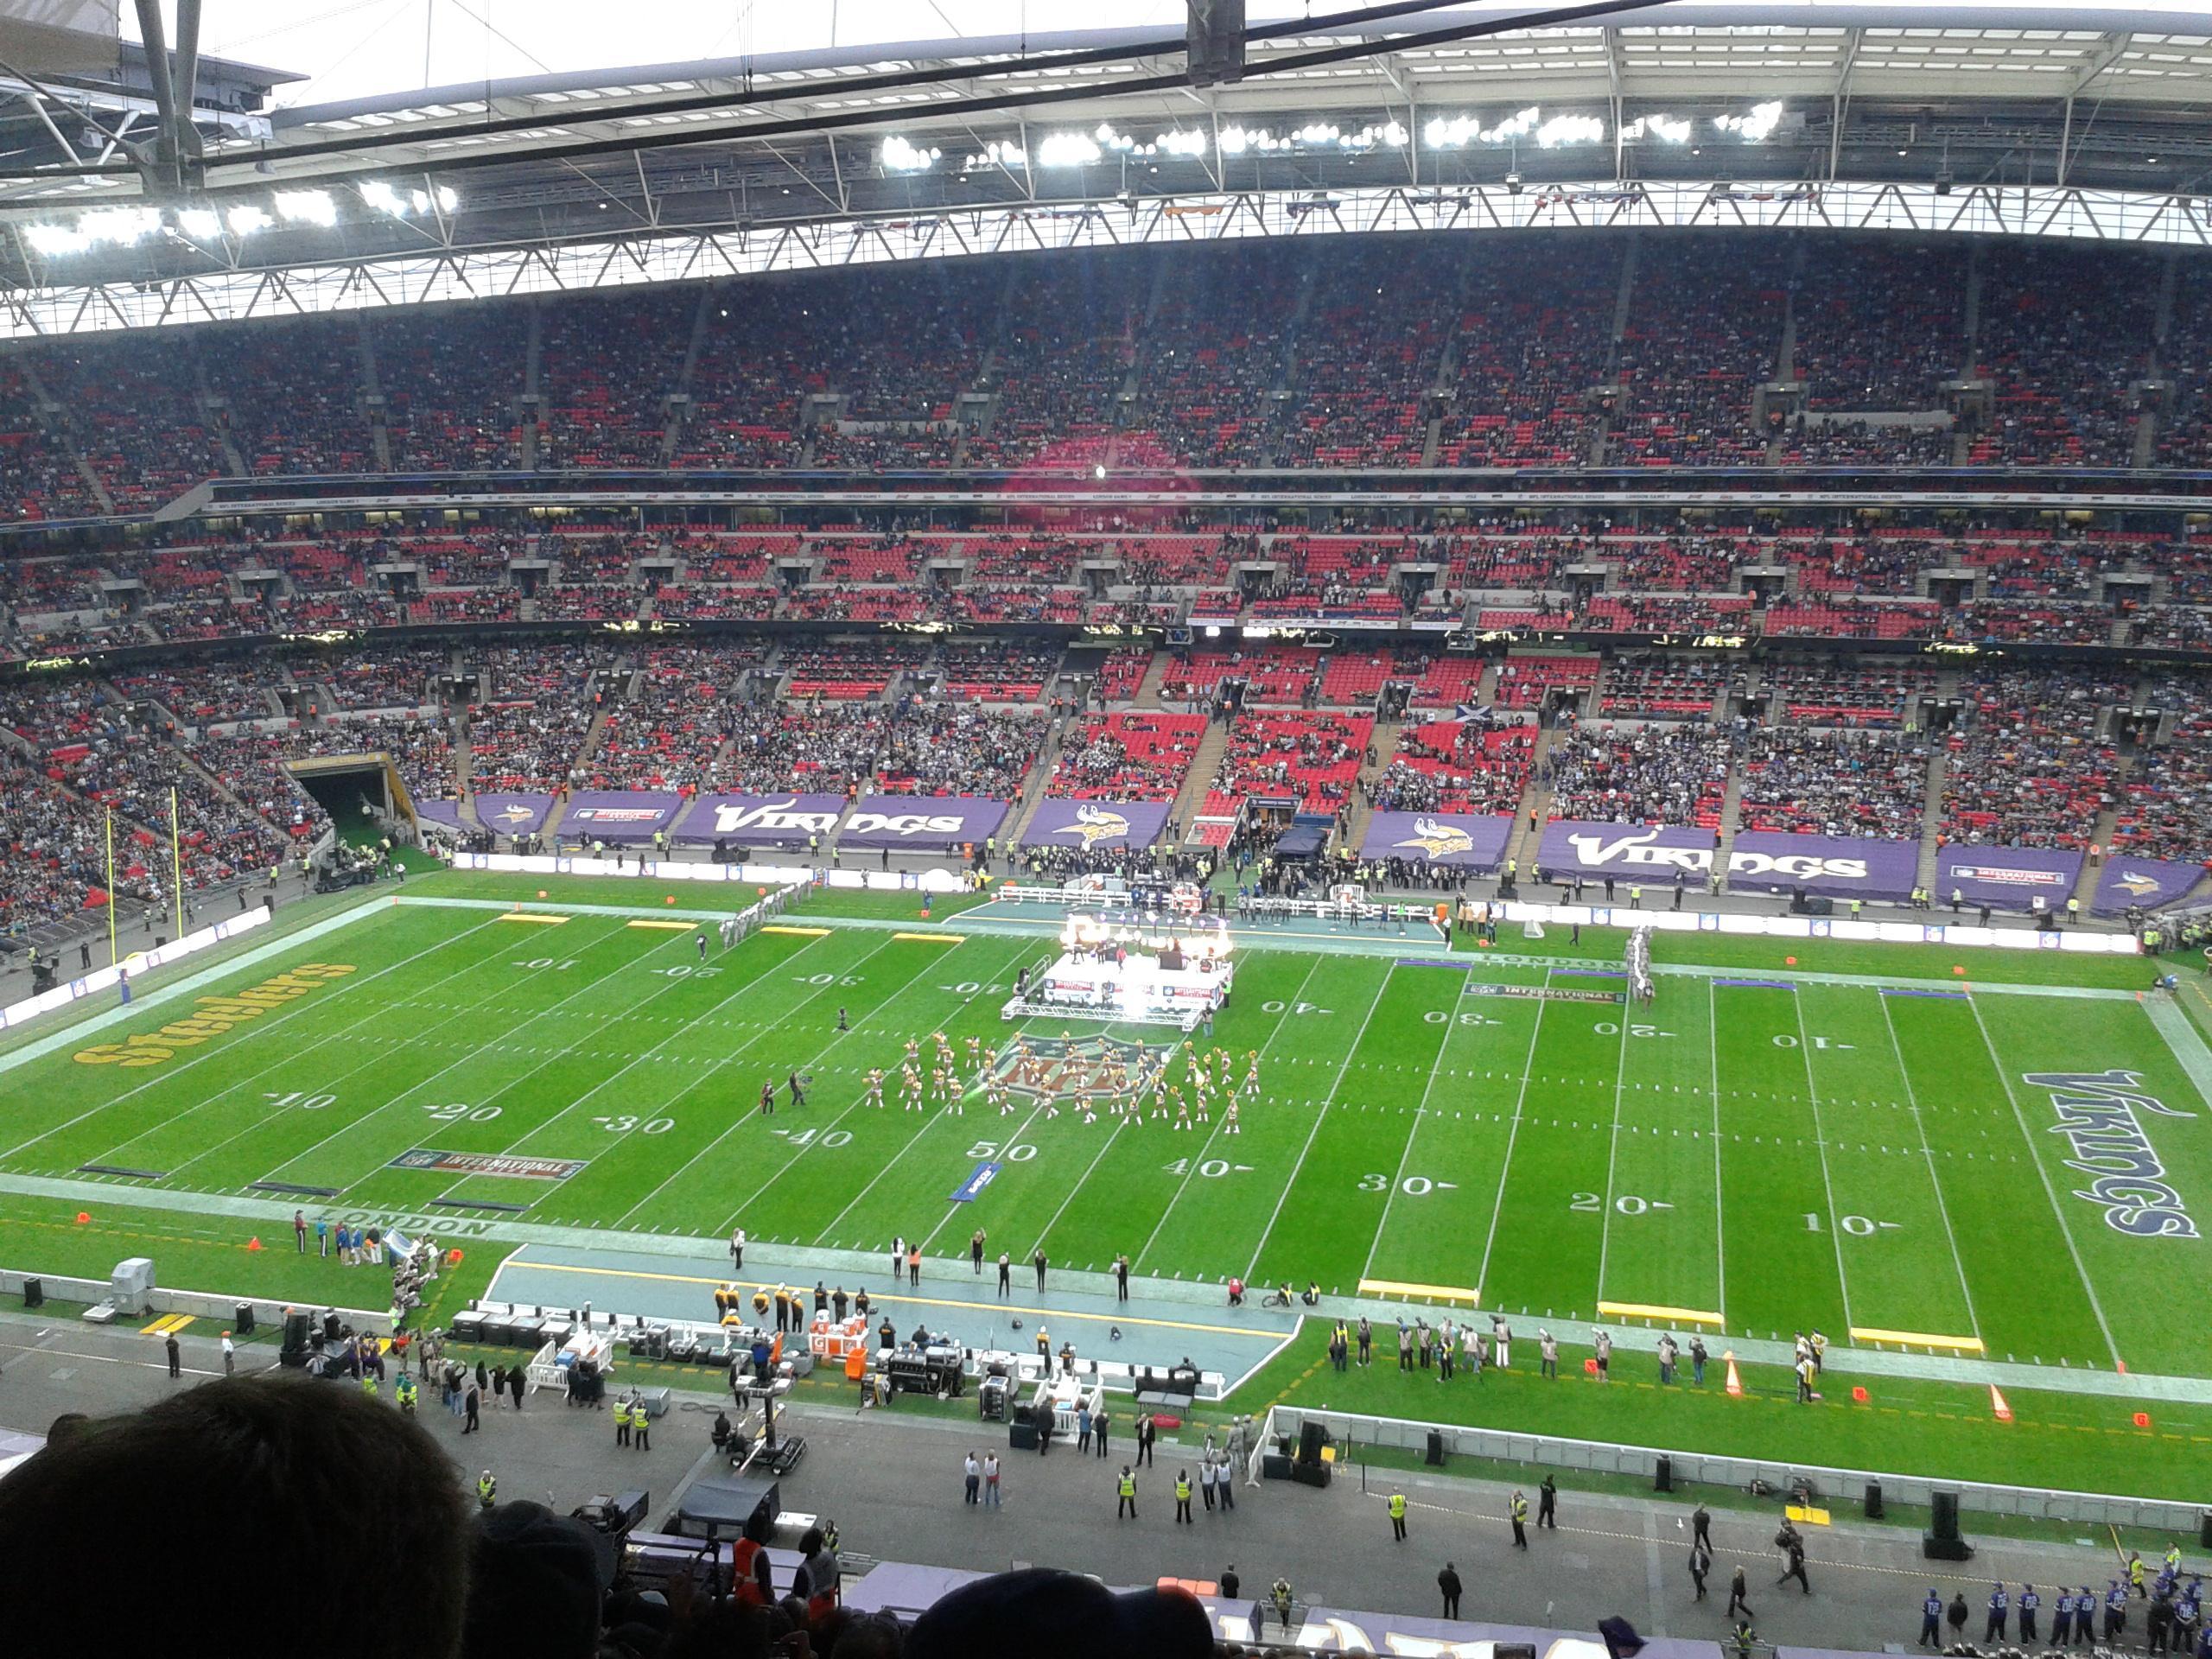 Wembley Stadium Section 524 Row 25 Seat 333